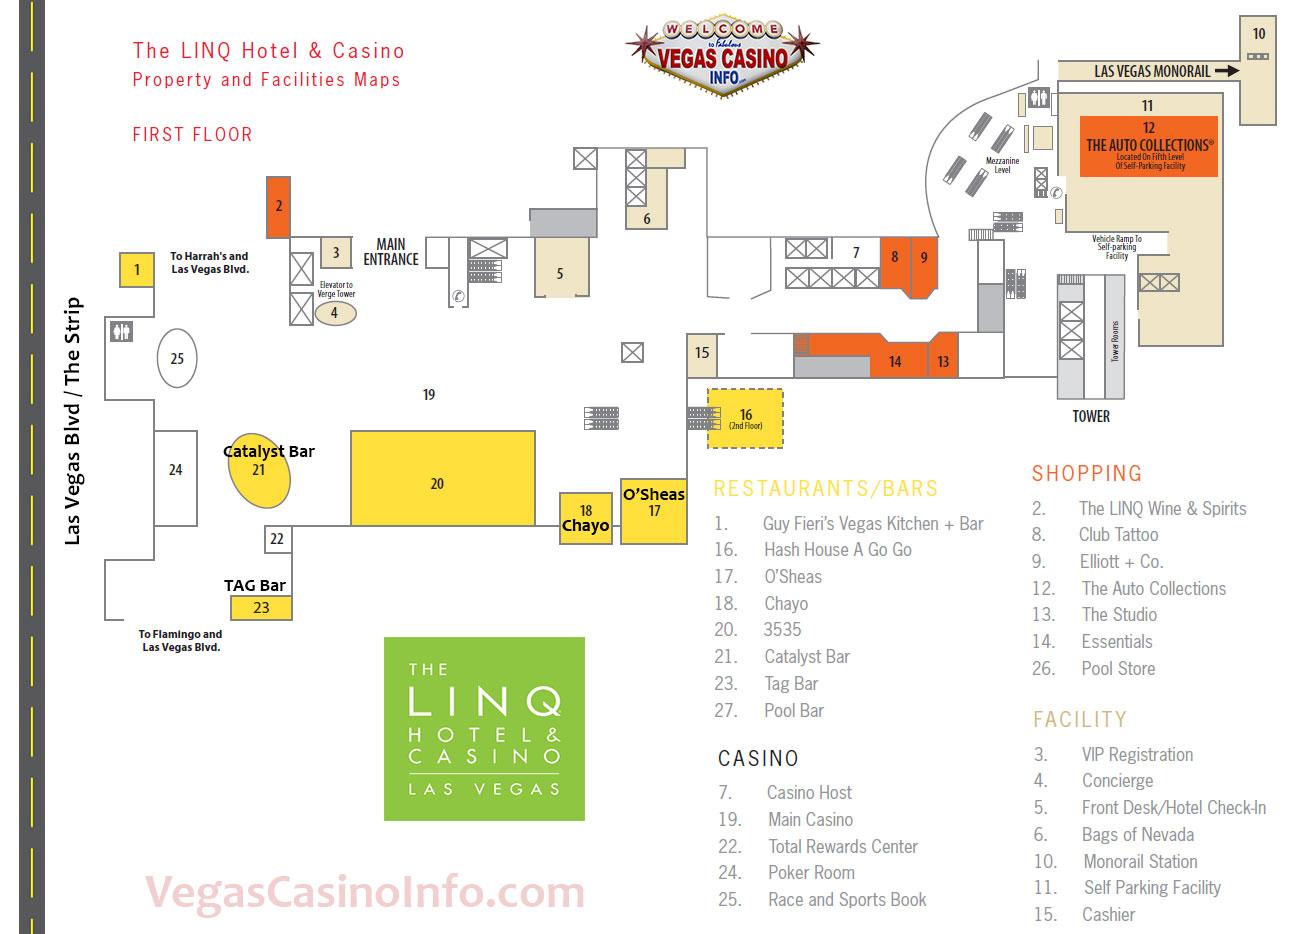 The Linq Las Vegas Map The Linq Property Map | Vegas Casino Info